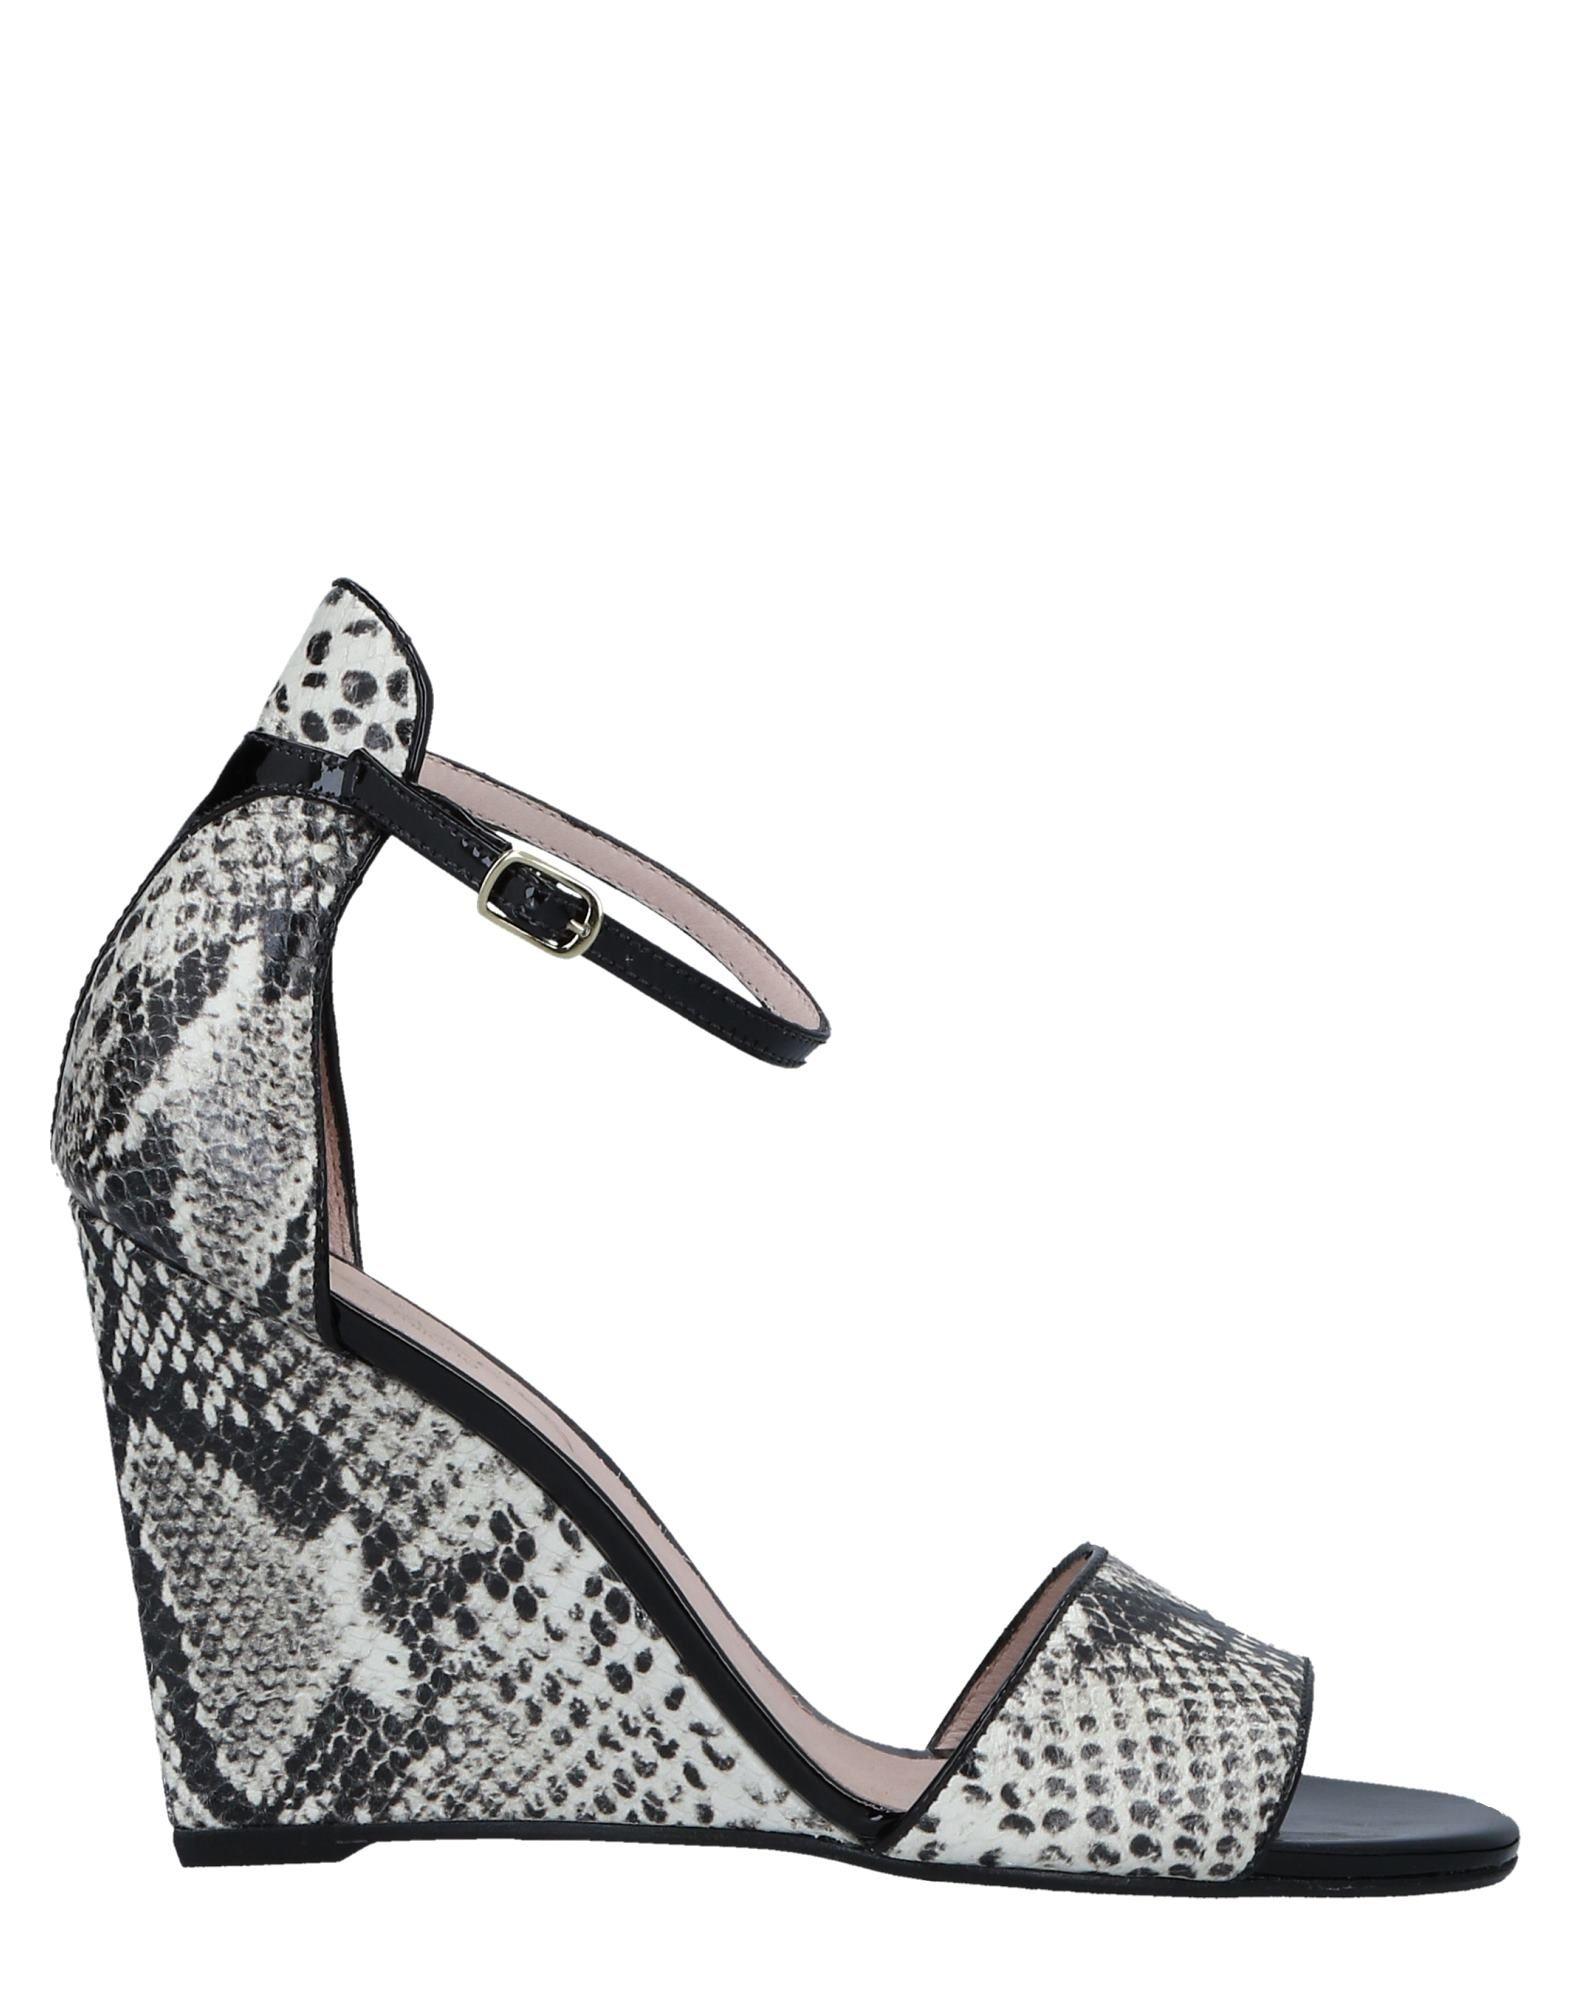 Stringate Castañer Donna e - 11328407SN Nuove offerte e Donna scarpe comode 7c6c89